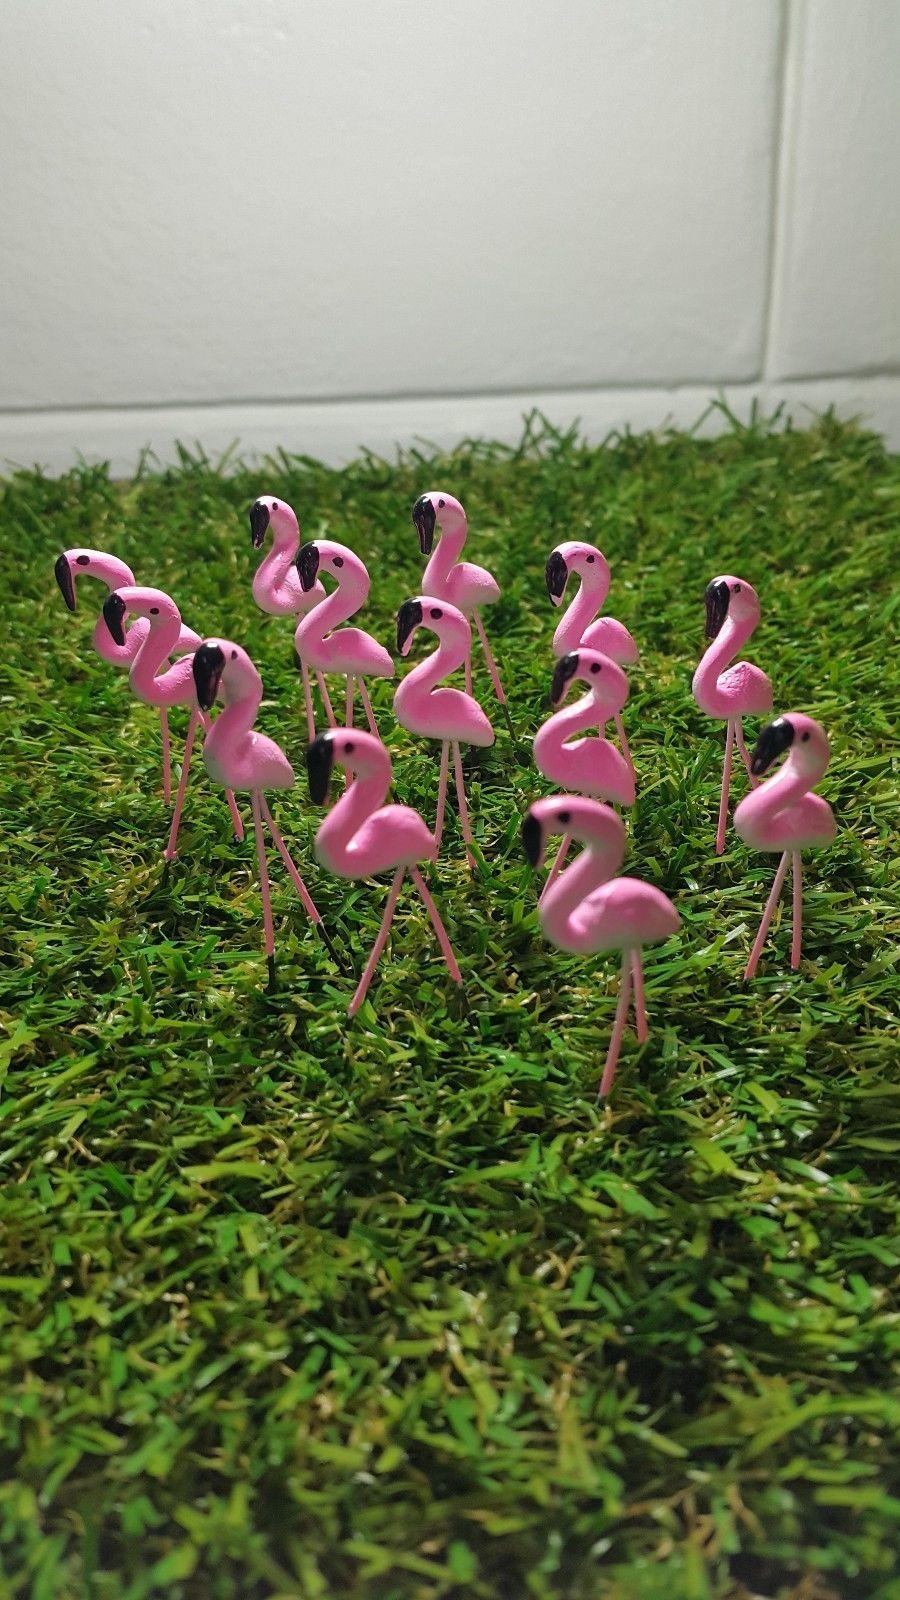 25 Tiny Flamingo Pink Colors Fairy Garden Decor Yard Dollhouse ...